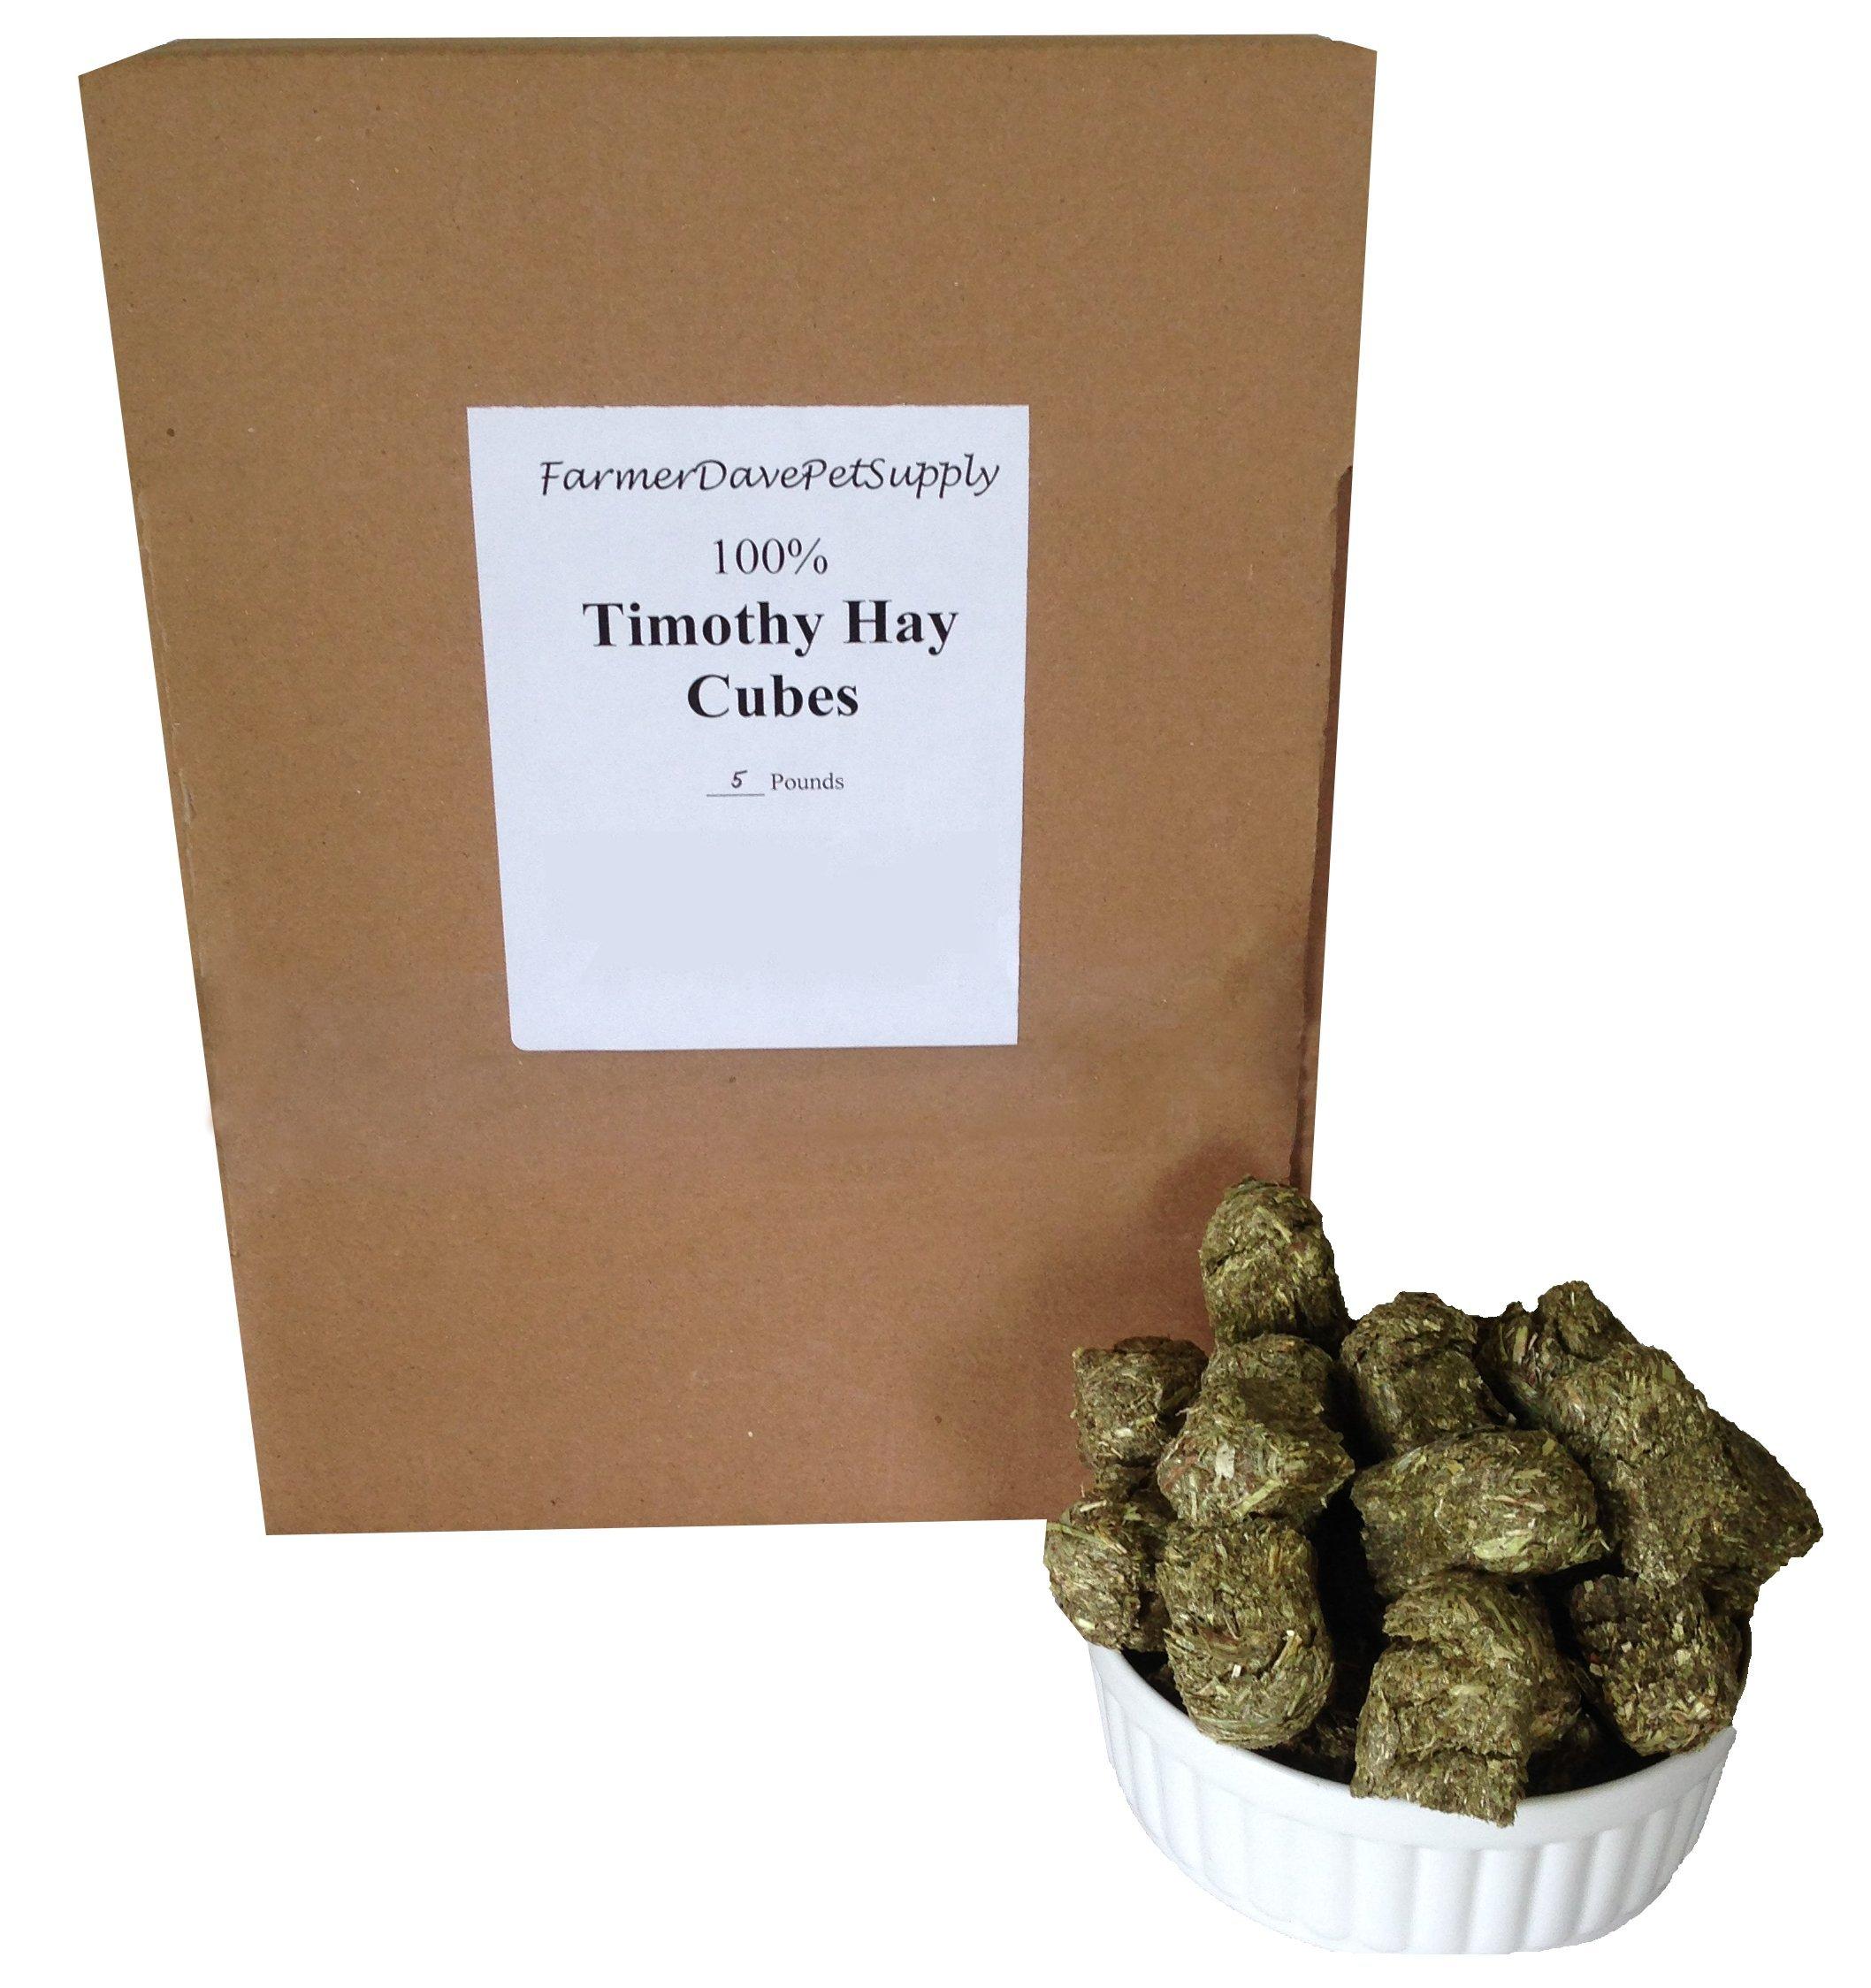 FarmerDavePetSupply 5 lb, TIMOTHY HAY MINI CUBES FOR PETS